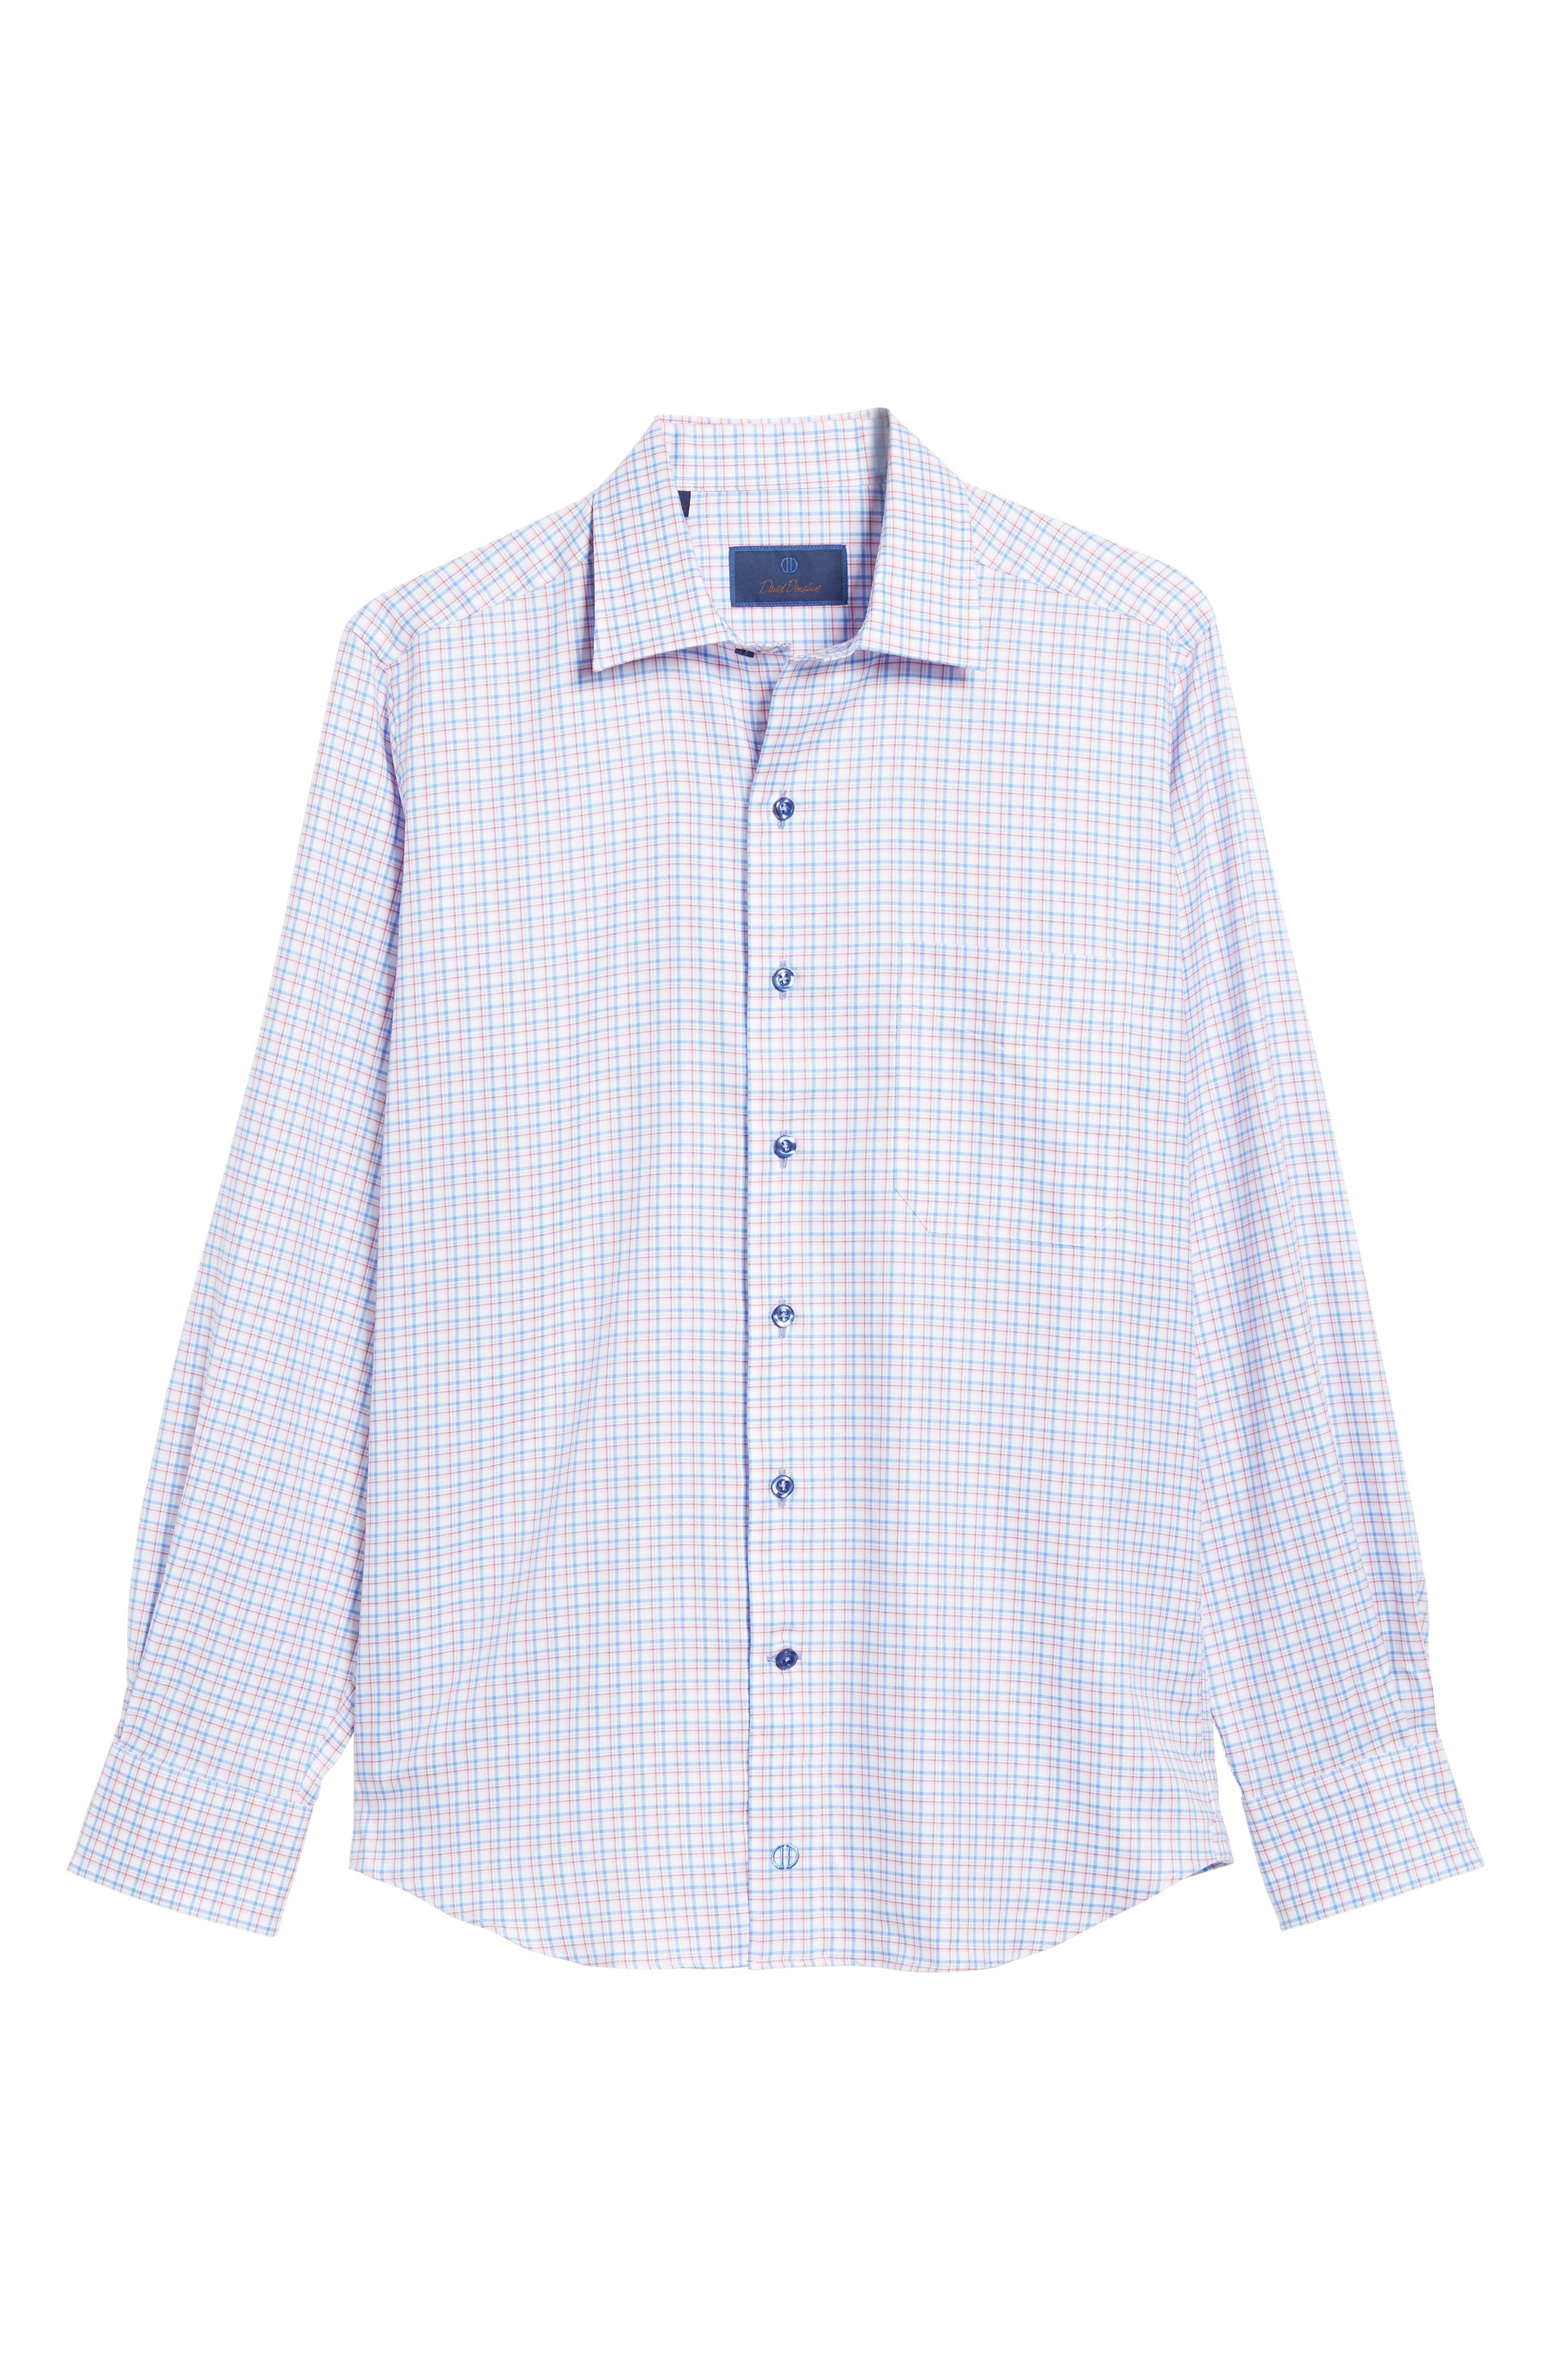 Regular Fit Check Sport Shirt,                             Alternate thumbnail 6, color,                             467